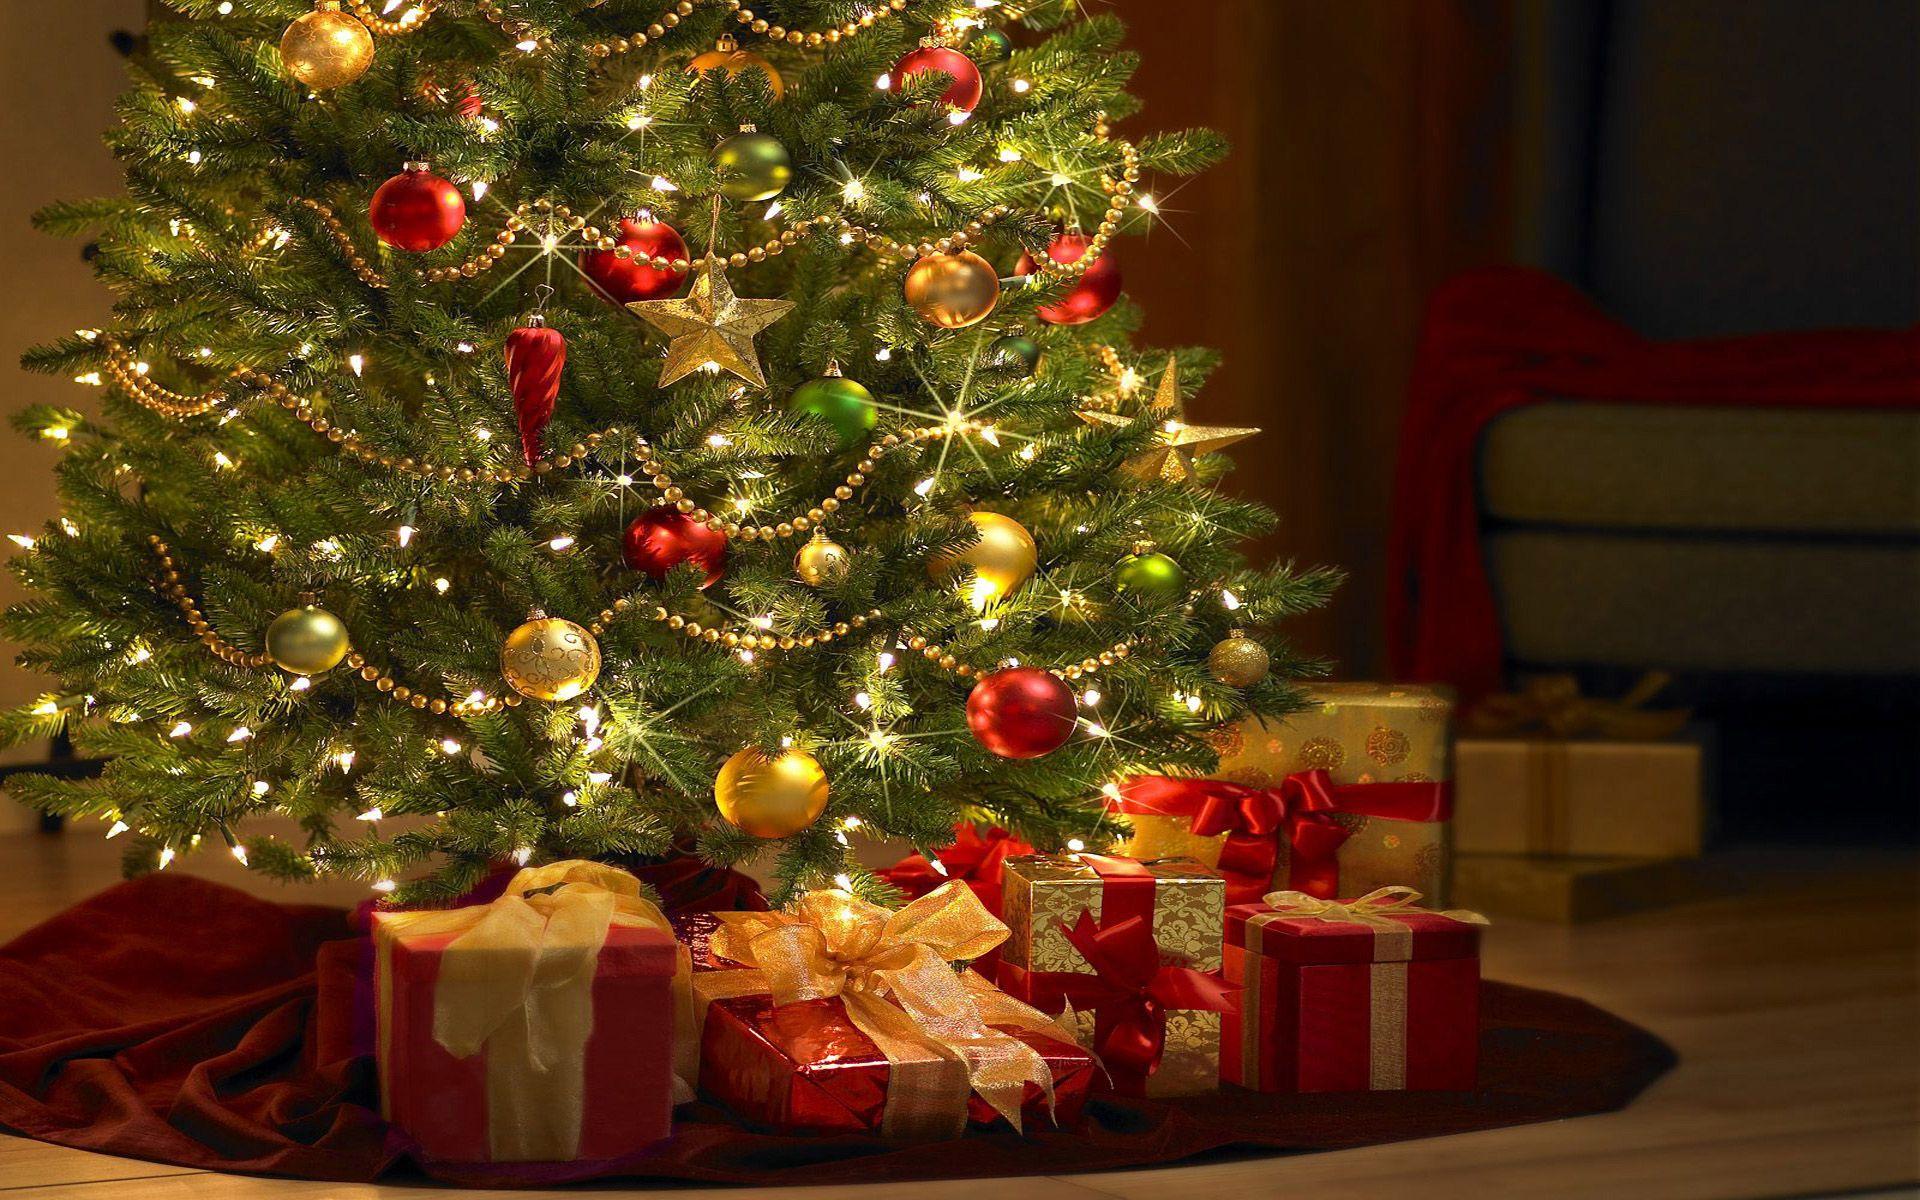 Beautiful Christmas Free Beautiful Christmas Tree With Gifts Computer Desktop Christmas Tree Wallpaper Christmas Tree Decorations Beautiful Christmas Trees